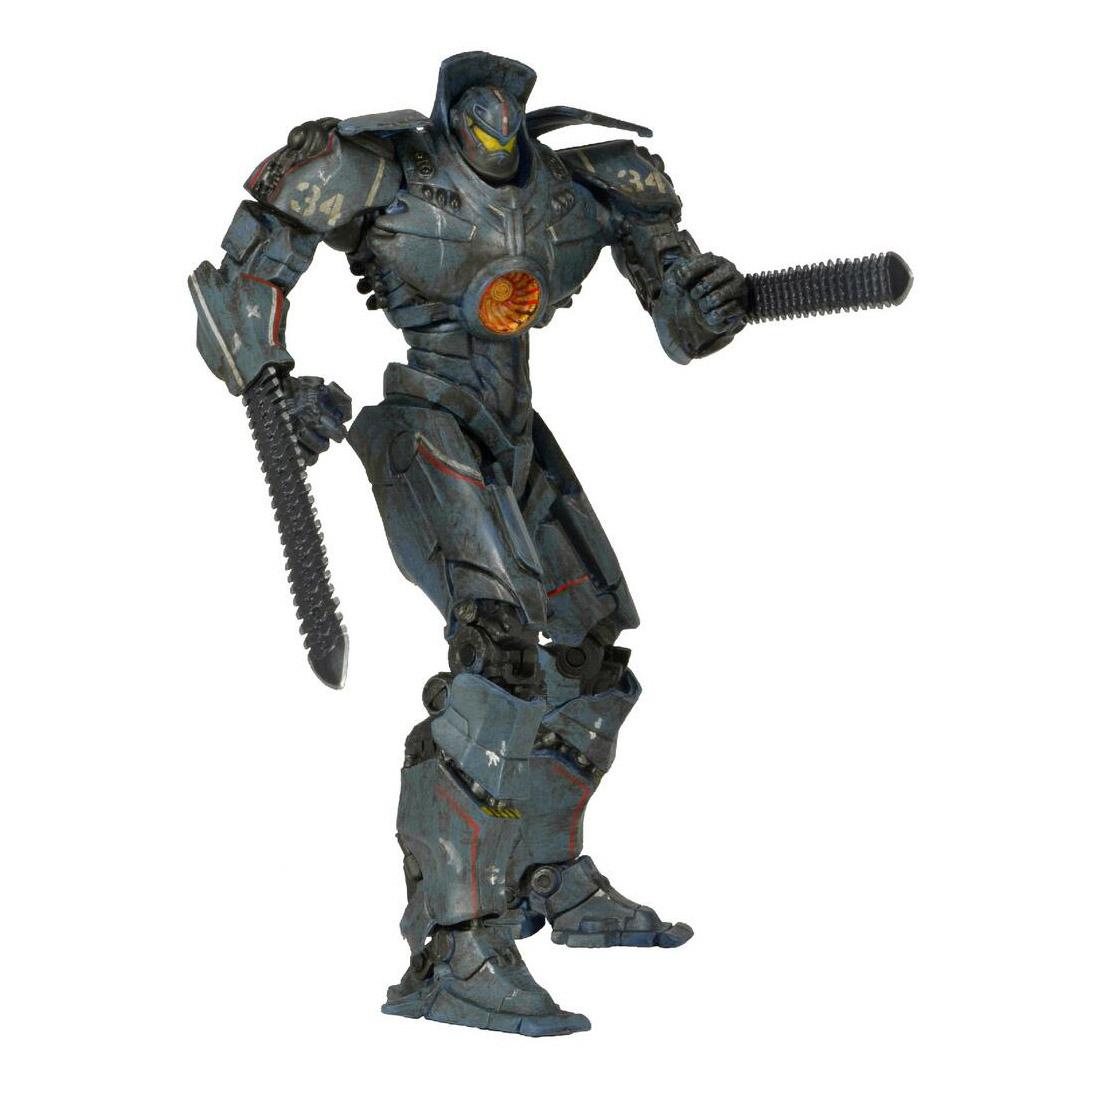 "NECA Pacific Rim 7"" Jaeger Gipsy Danger Battle Damage Ver ... Pacific Rim Jaeger Gypsy Danger Sword"